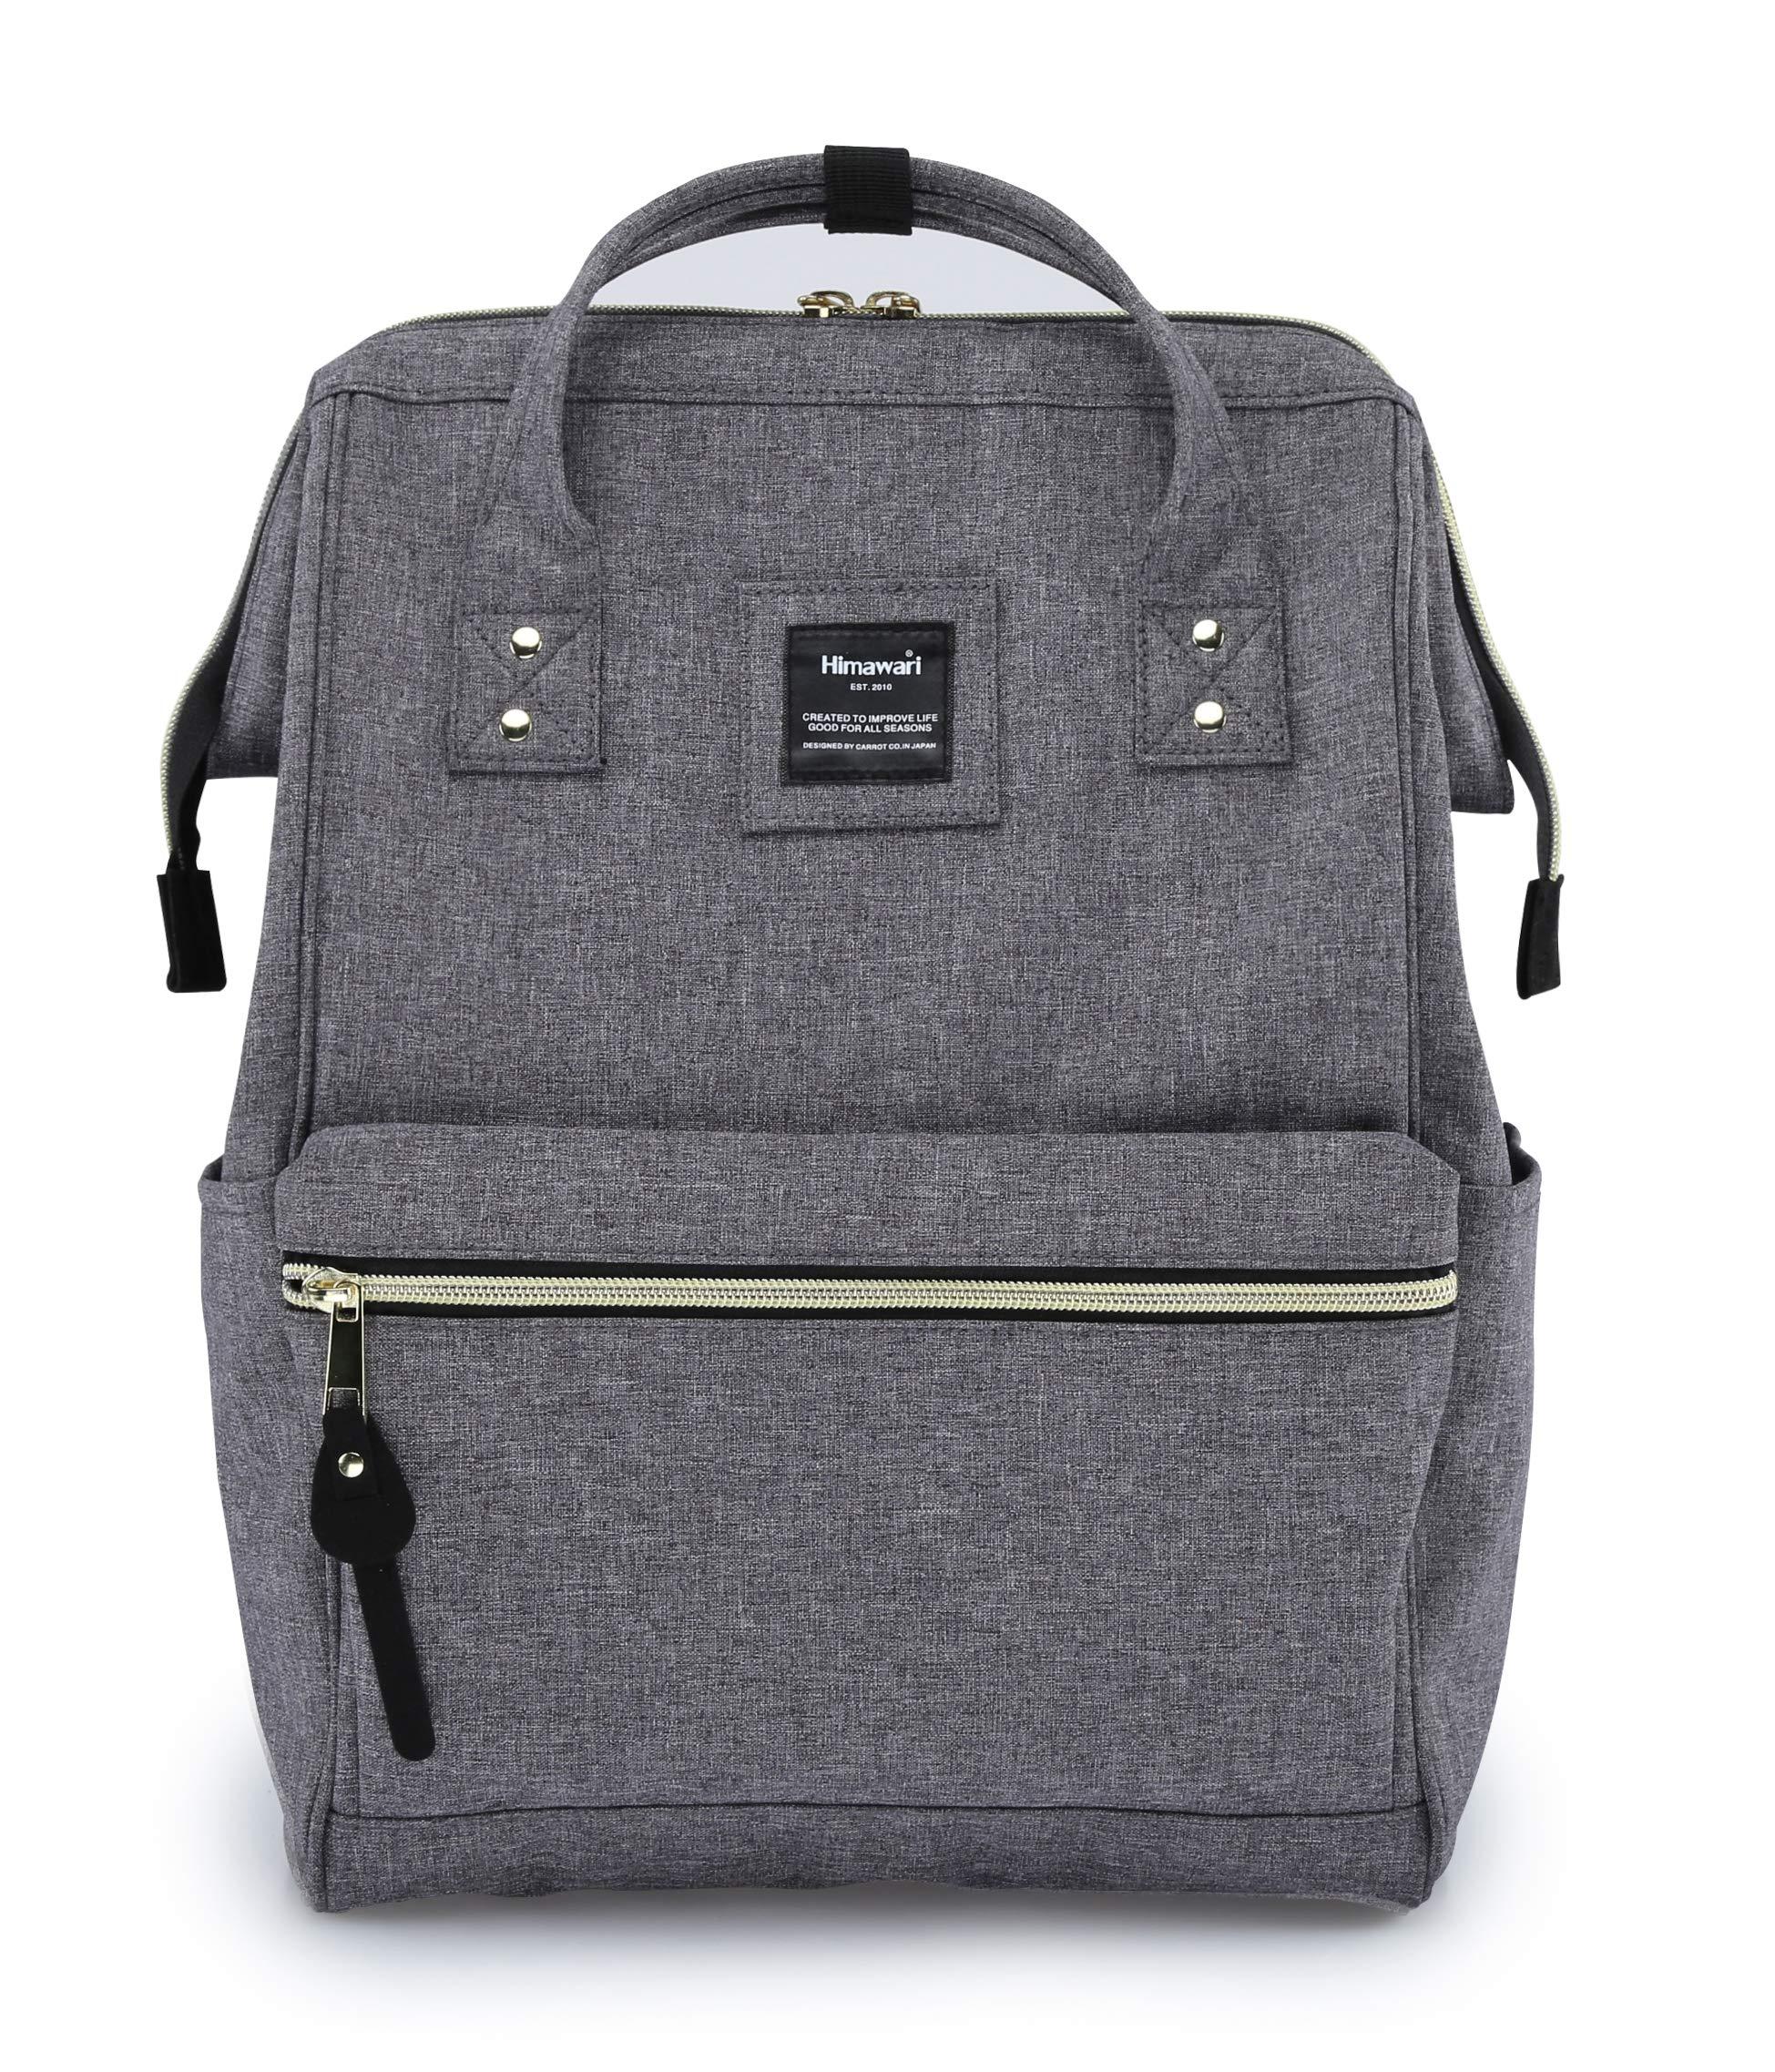 Himawari Travel Backpack With USB Charging Port Large Diaper Bag Doctor Bag School Backpack for Women&Men, College Student Rucksack Fits 13.6 Inch Laptop(USB Gray) by himawari